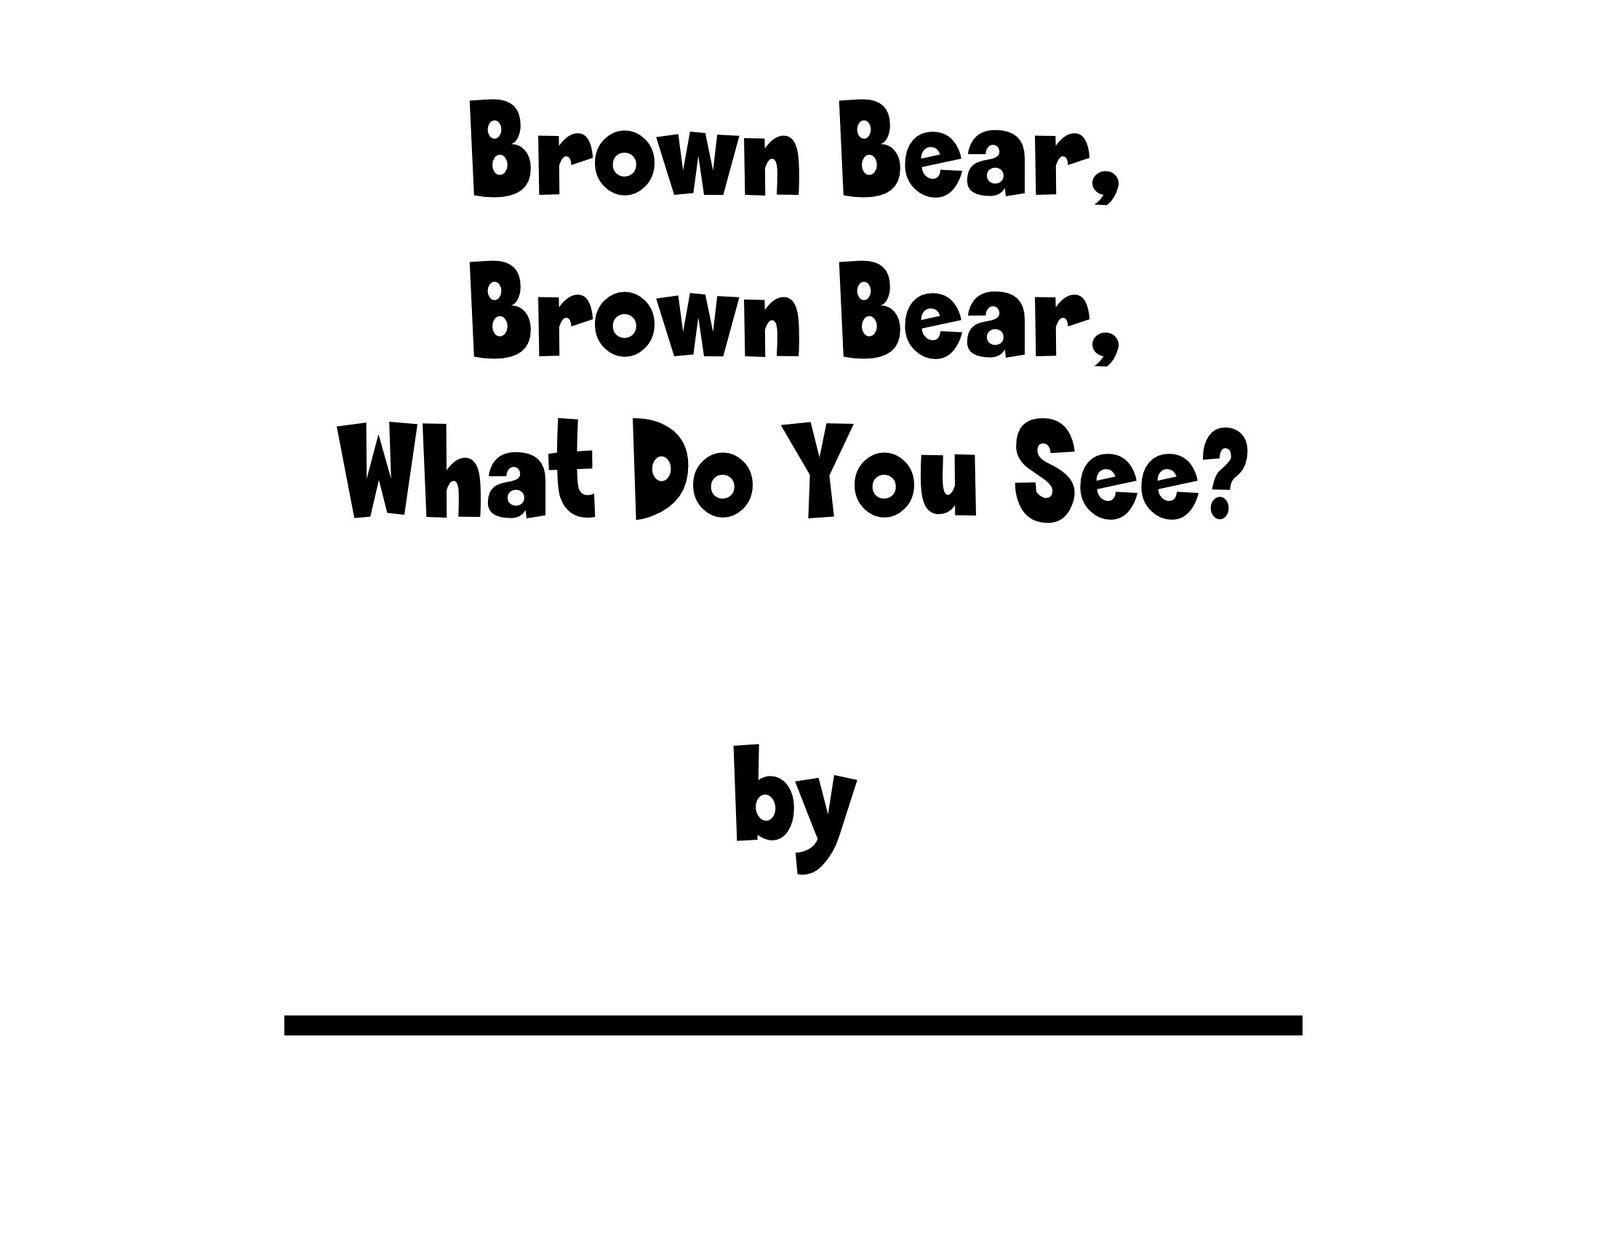 Ms Carlie S Little Learners Preschool Brown Bear Brown Bear What Do You See